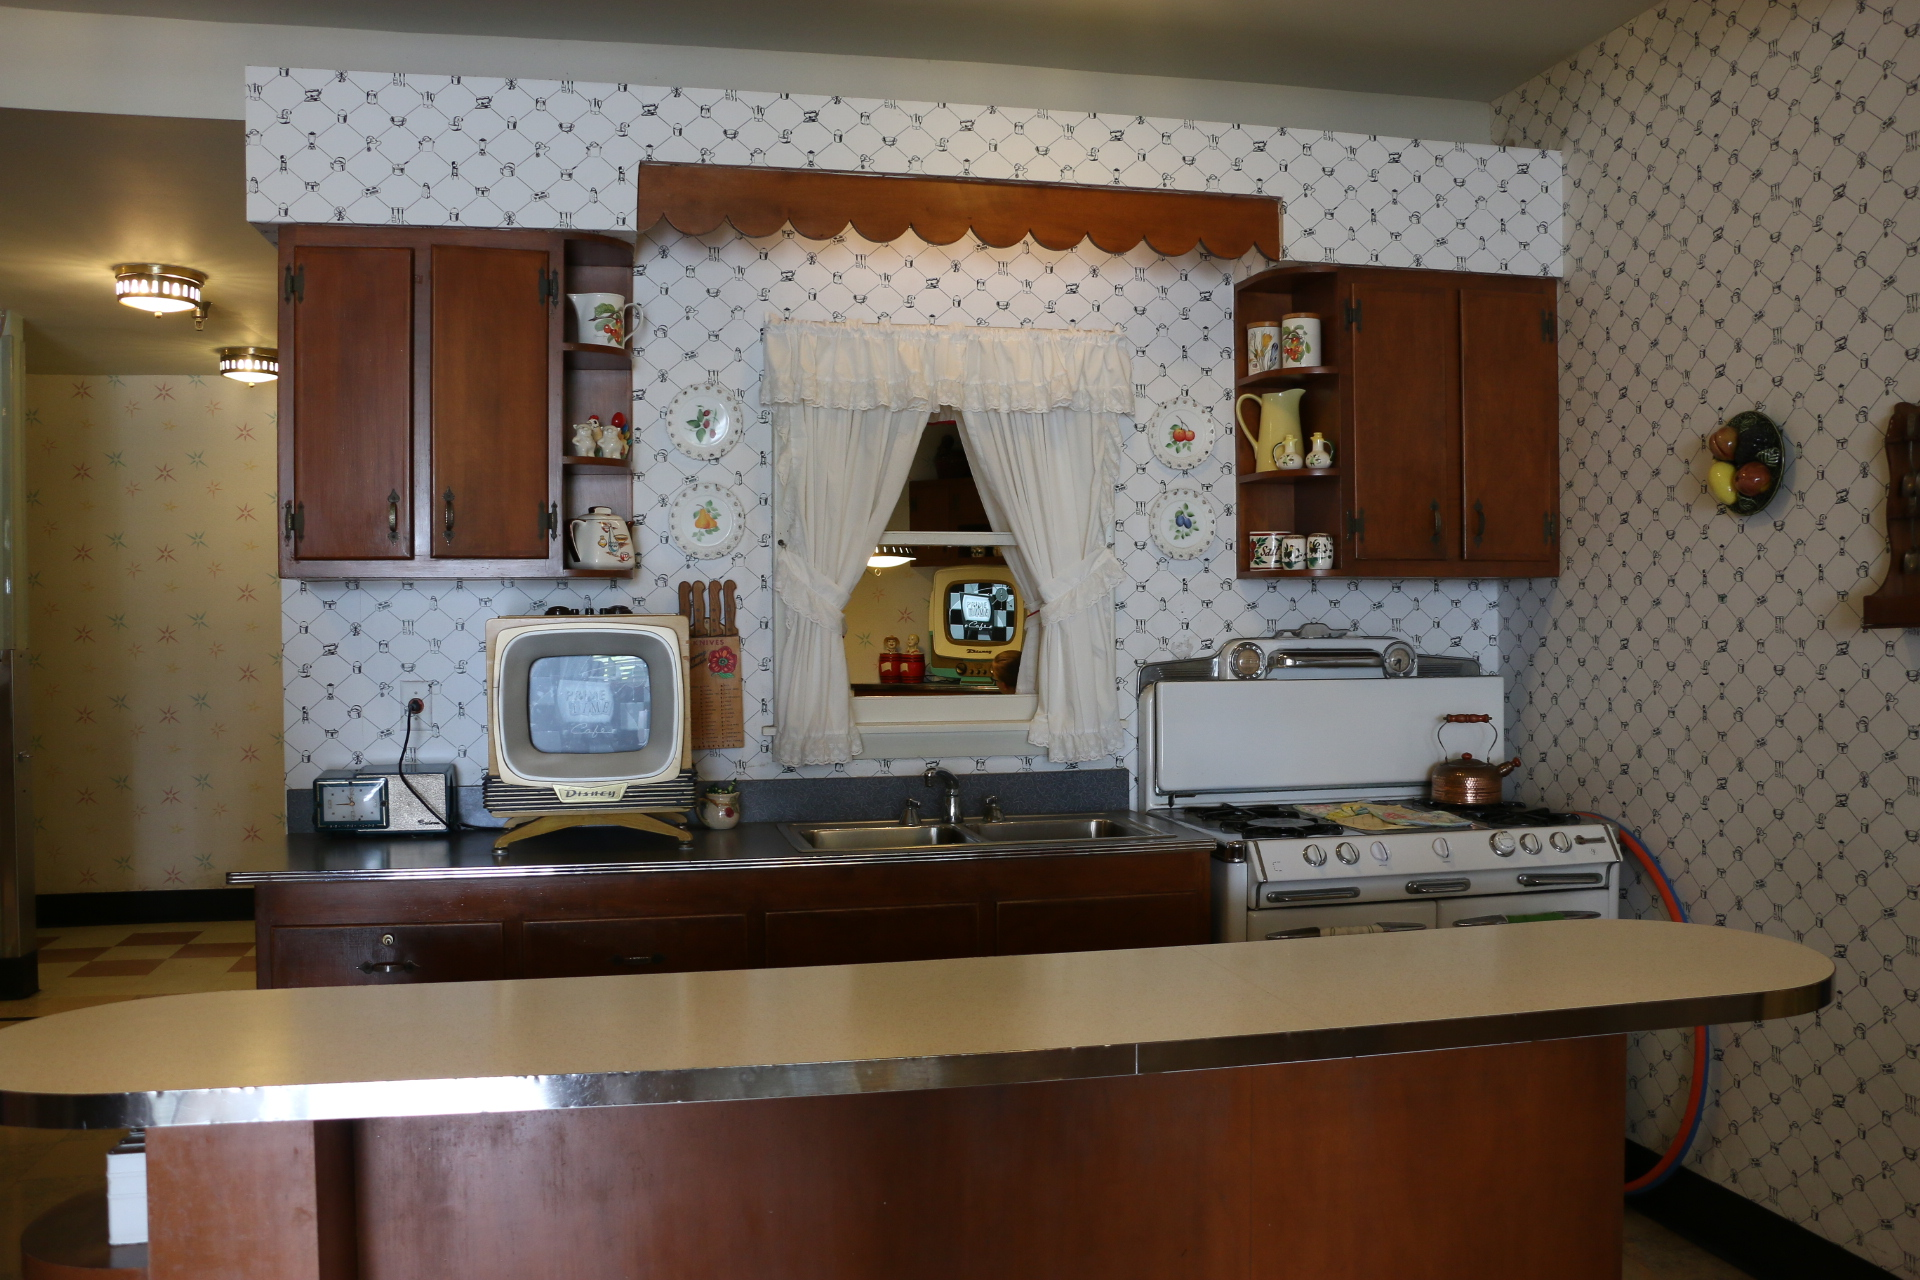 retro kitchen at 50s prime time